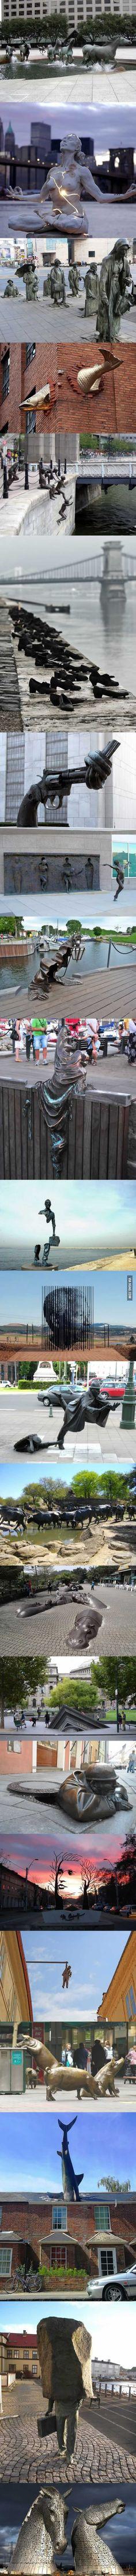 Creative Statues                                                                                                                                                      More